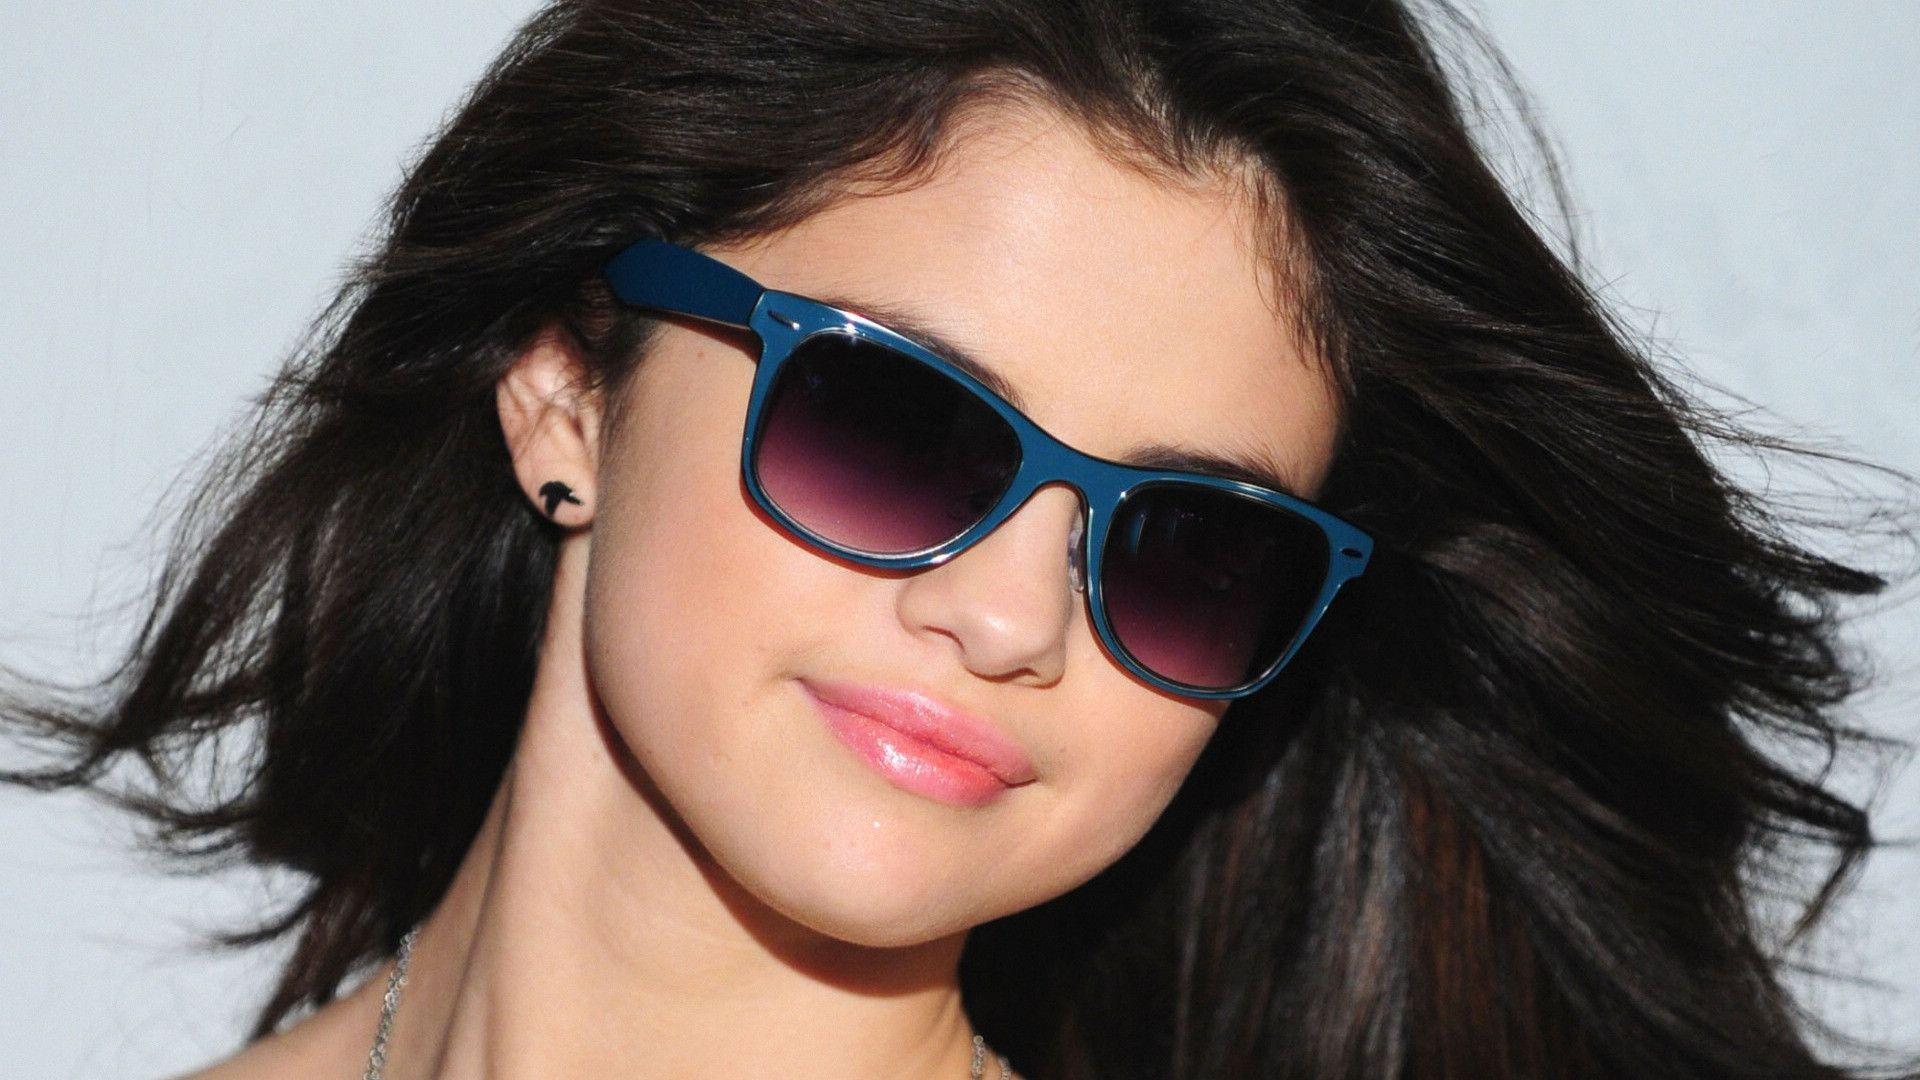 Selena Gomez Sunglasses Wallpaper 39787 in Celebrities F ...